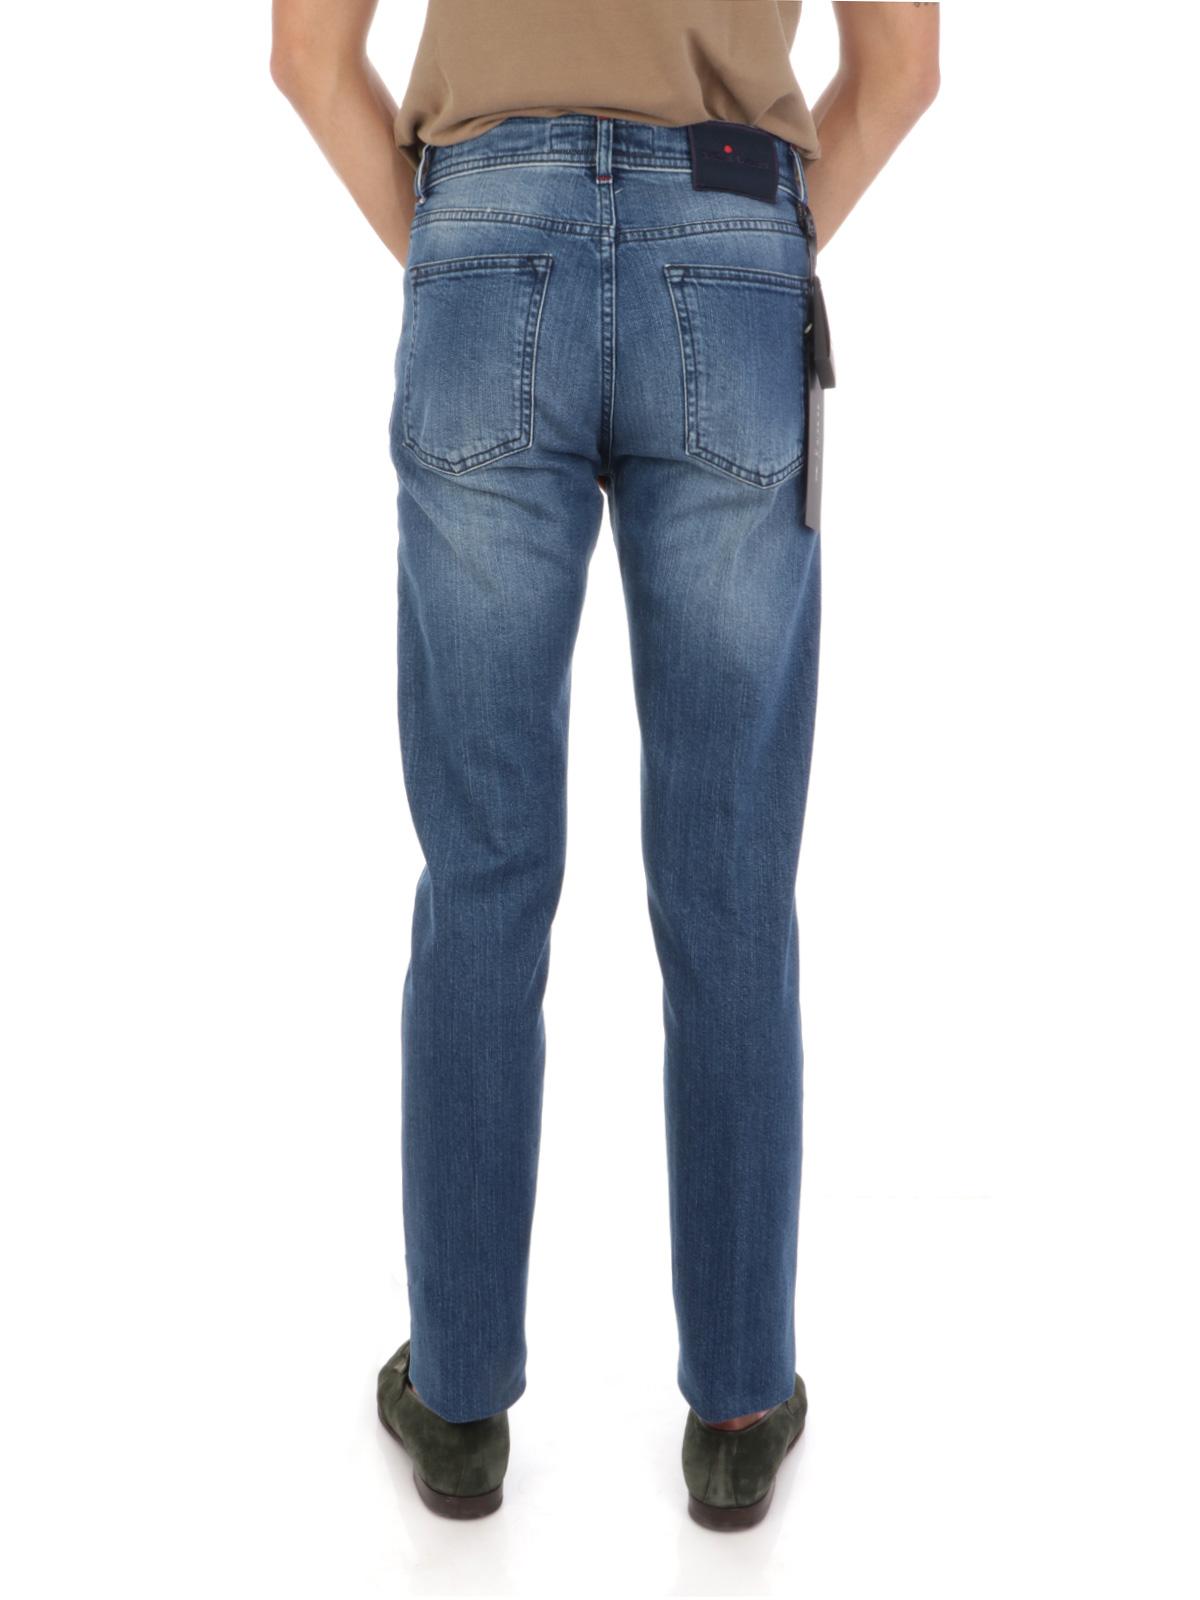 Immagine di Kiton | Trousers Pantaloni Uomo